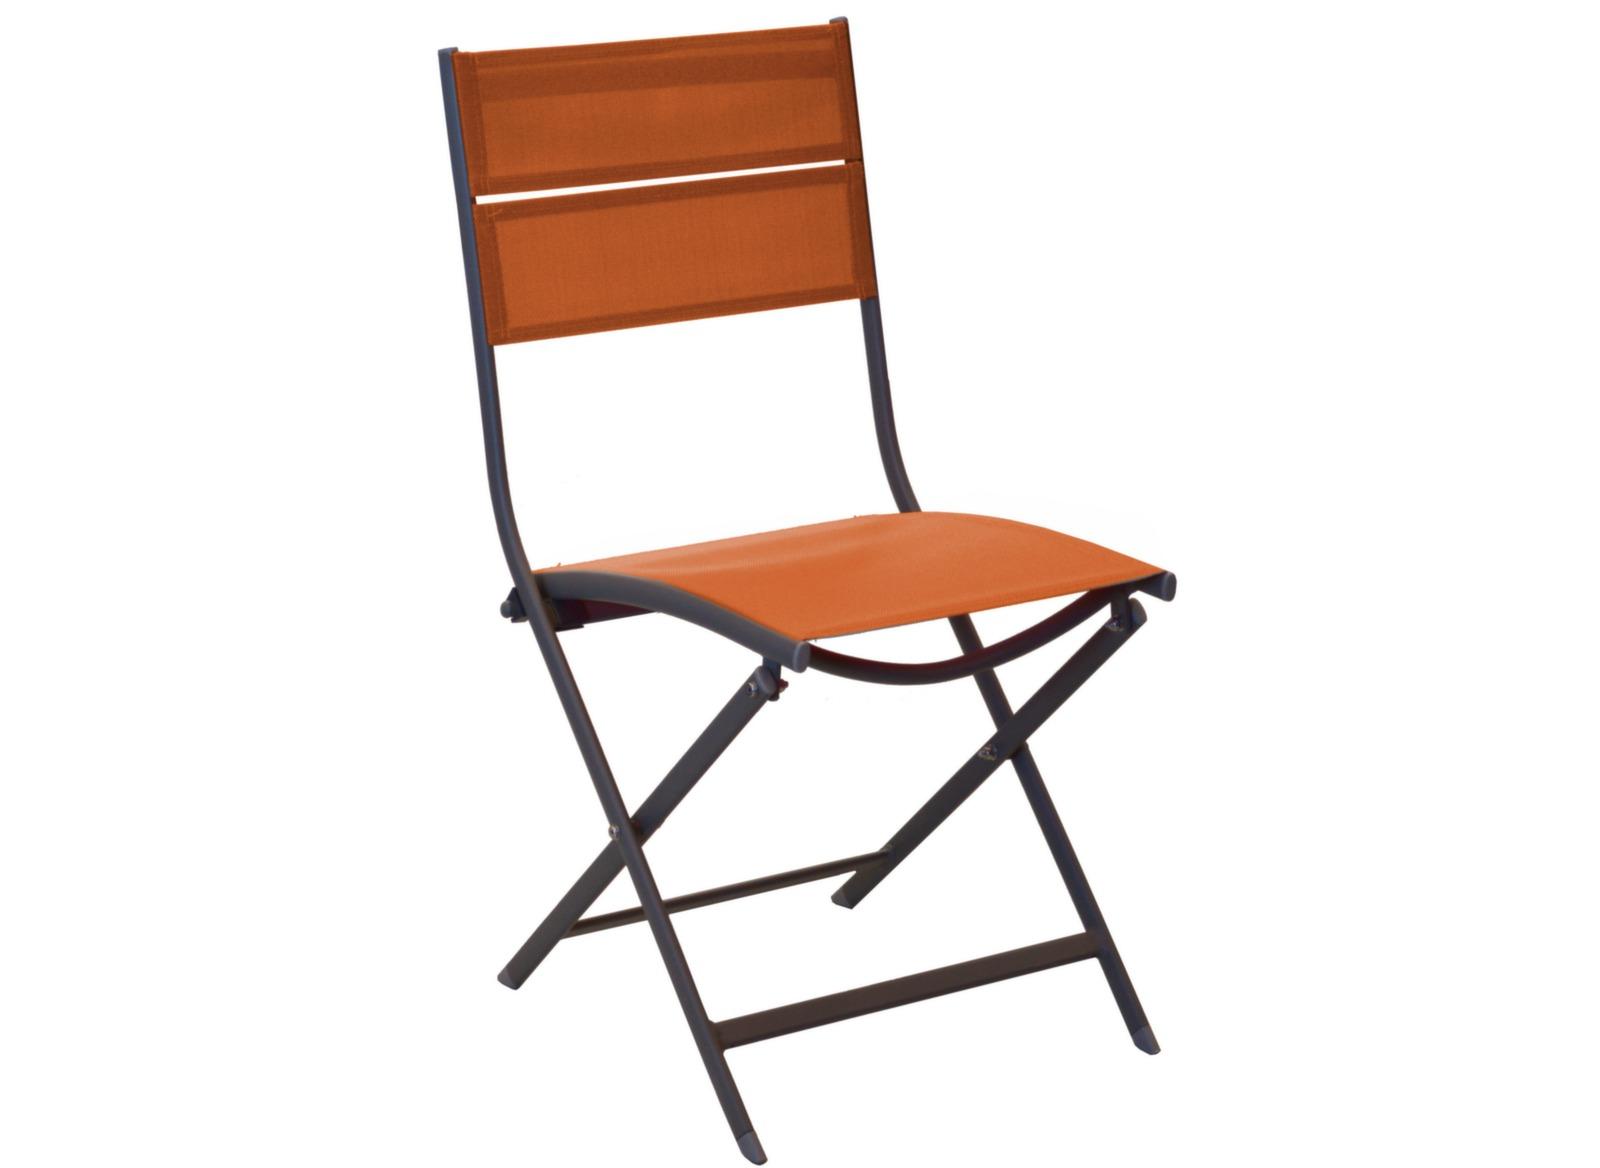 Chaise de jardin pliante en aluminium win oc o proloisirs - Chaise de bateau pliante ...